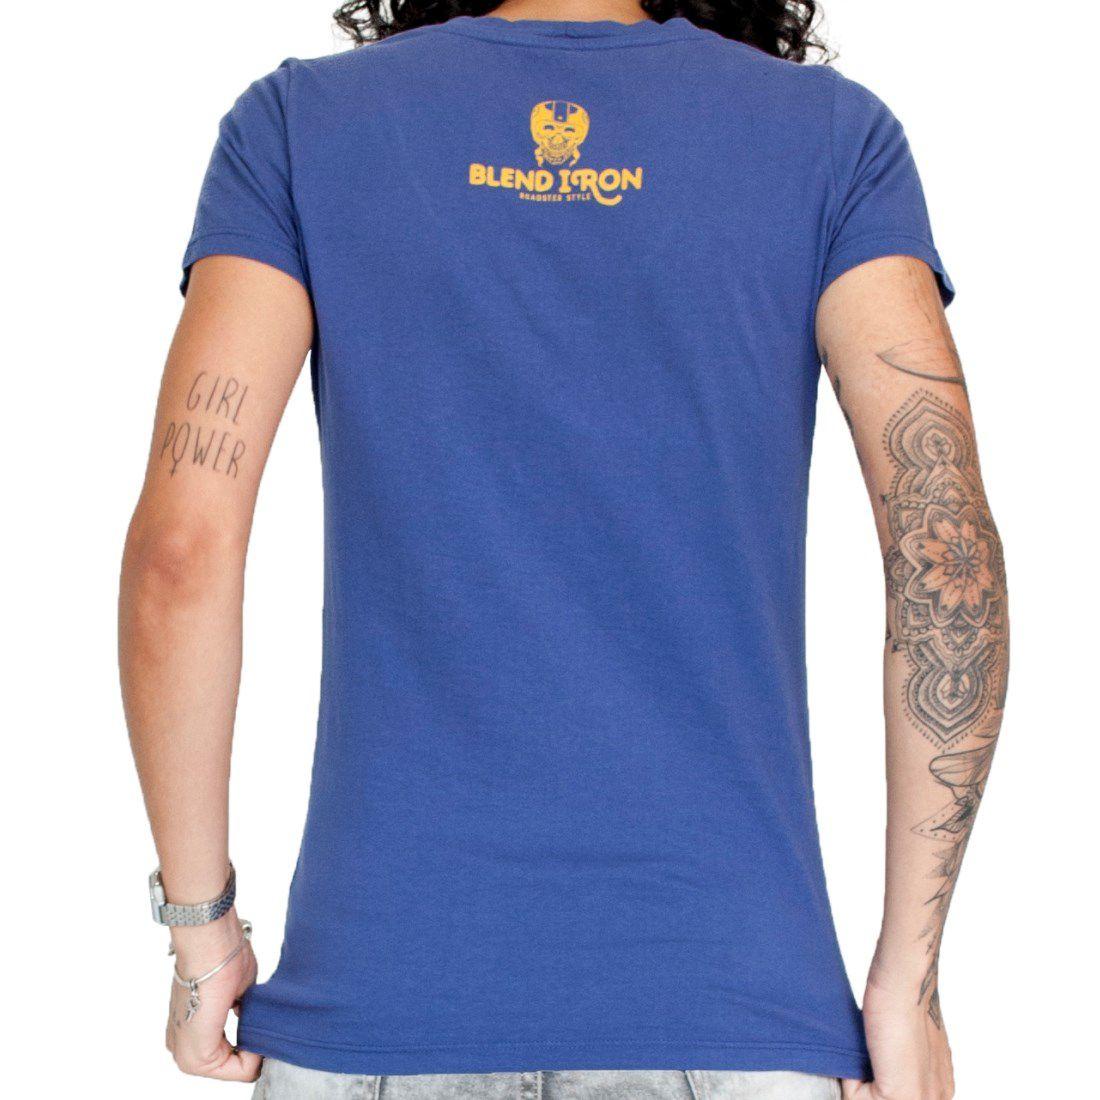 Camiseta Feminina - Roadster | Blend Iron